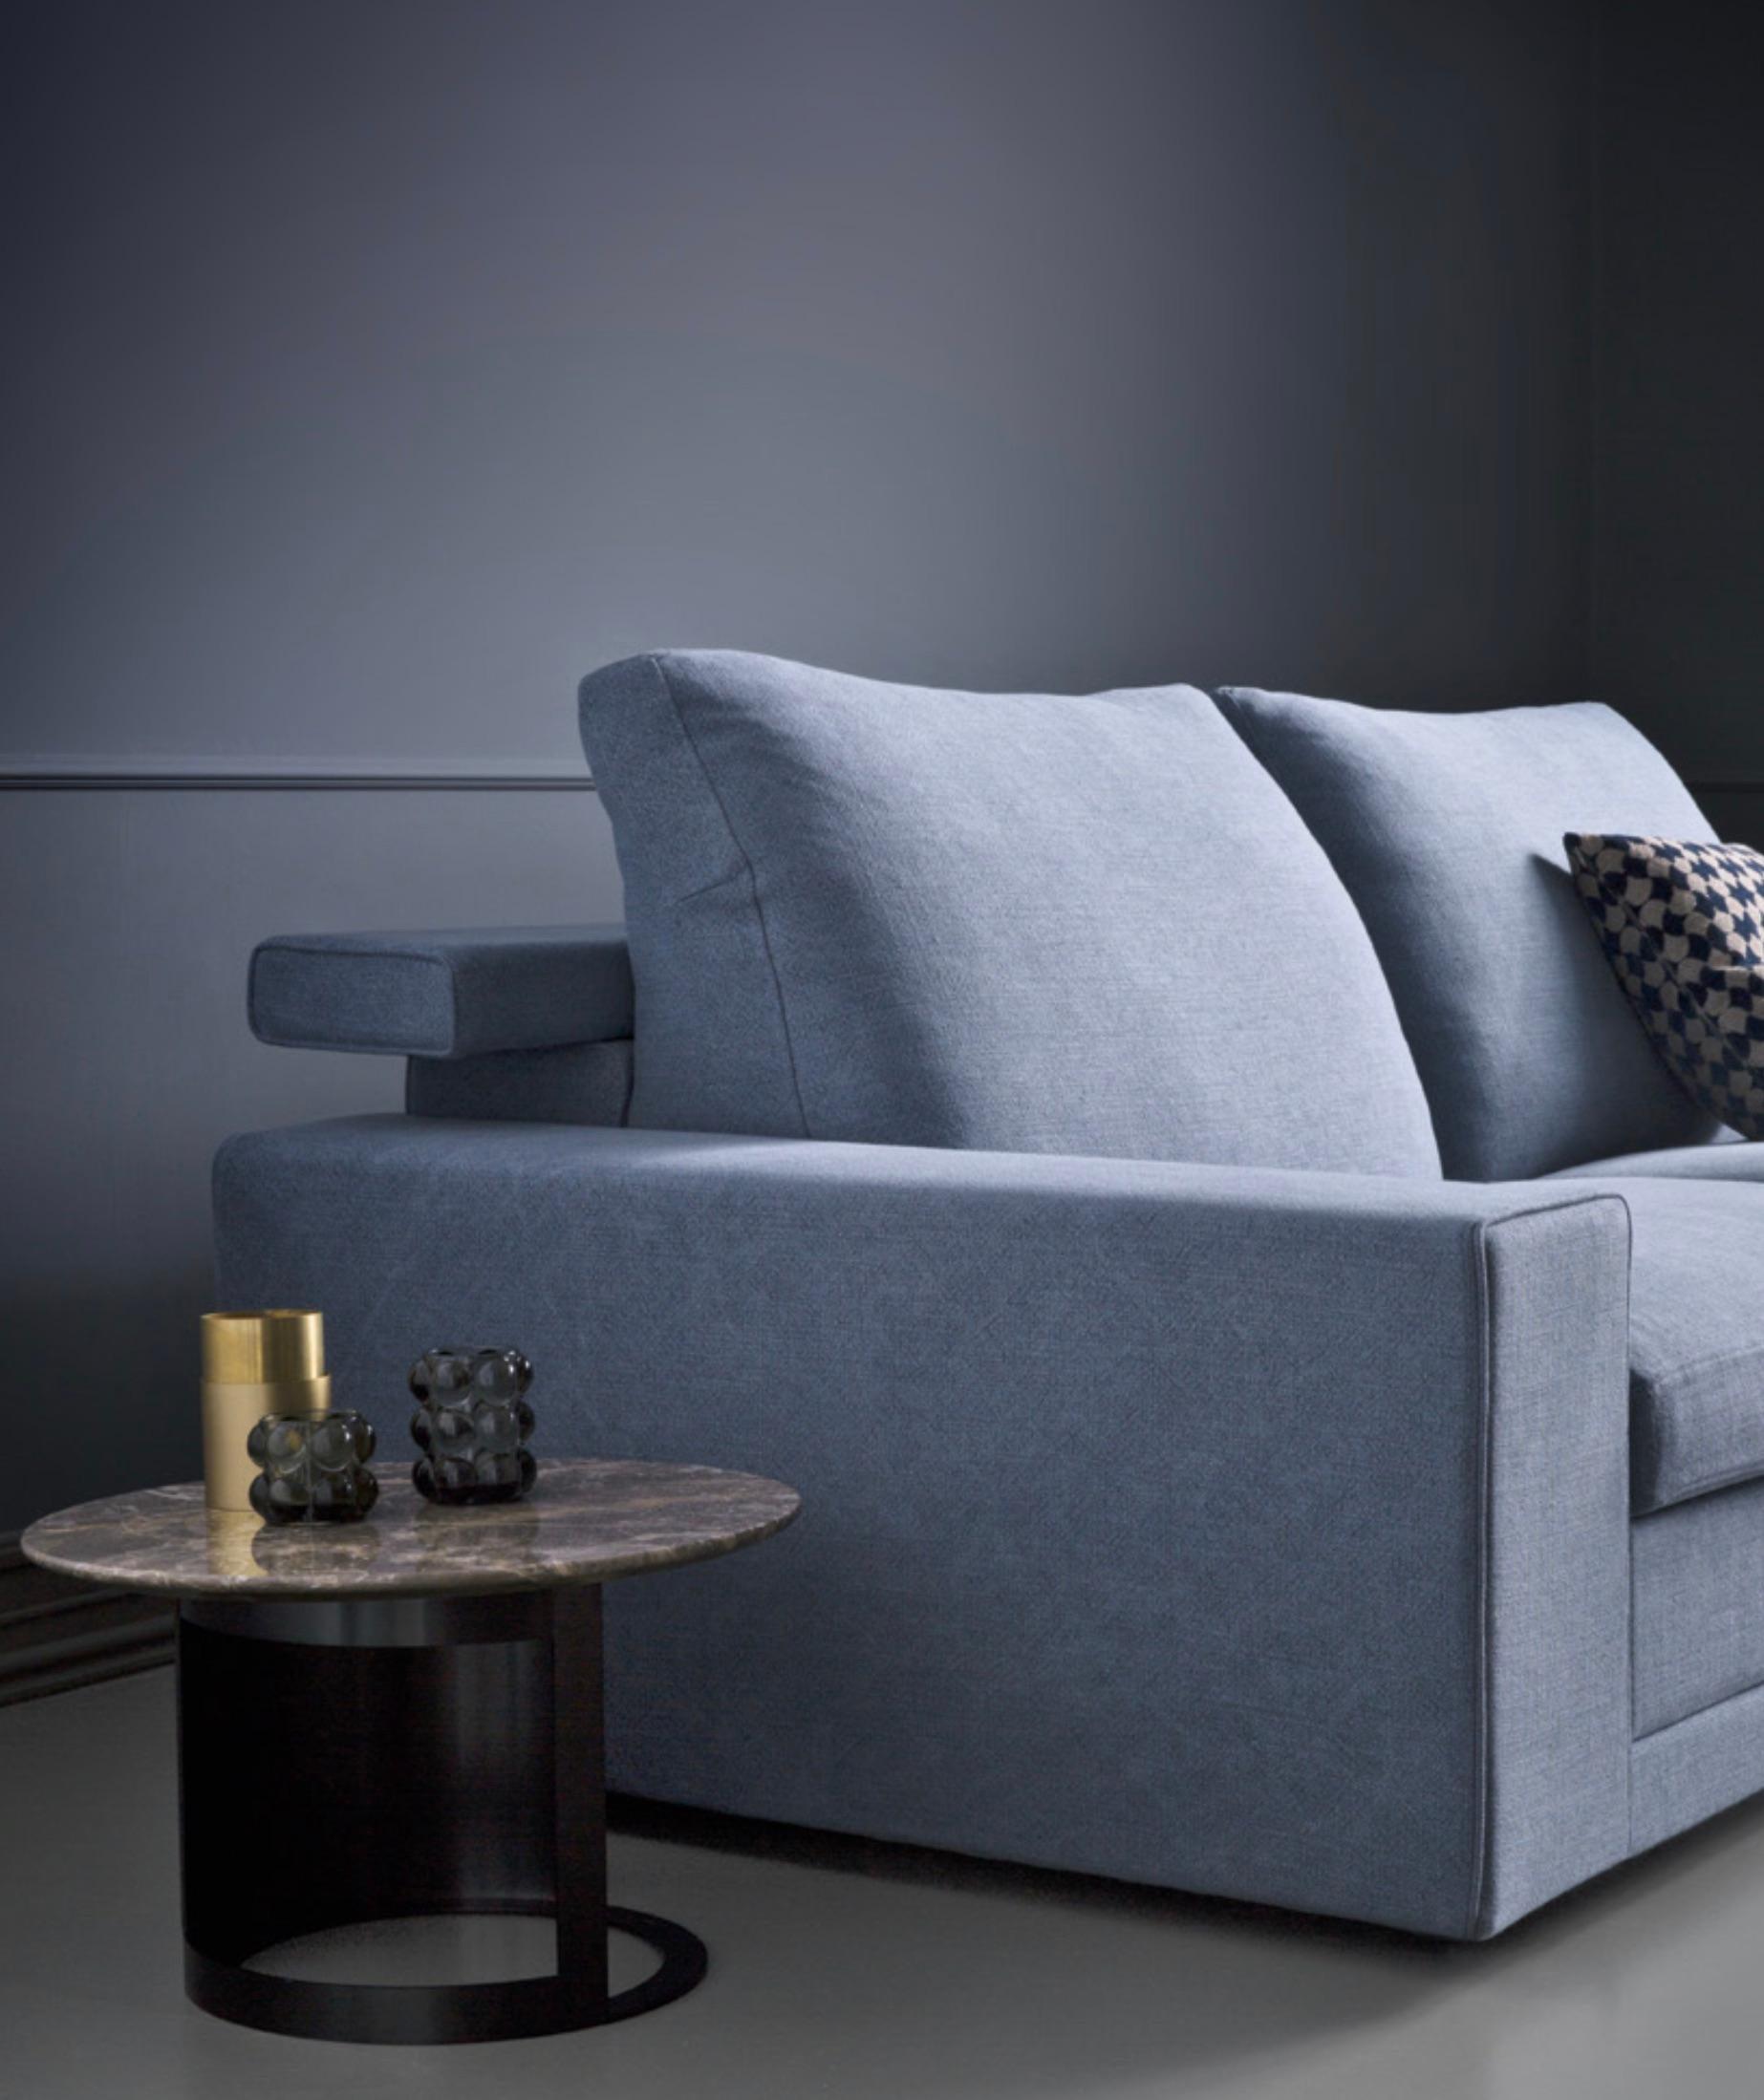 Italian Modern Sofa Bed With Flip